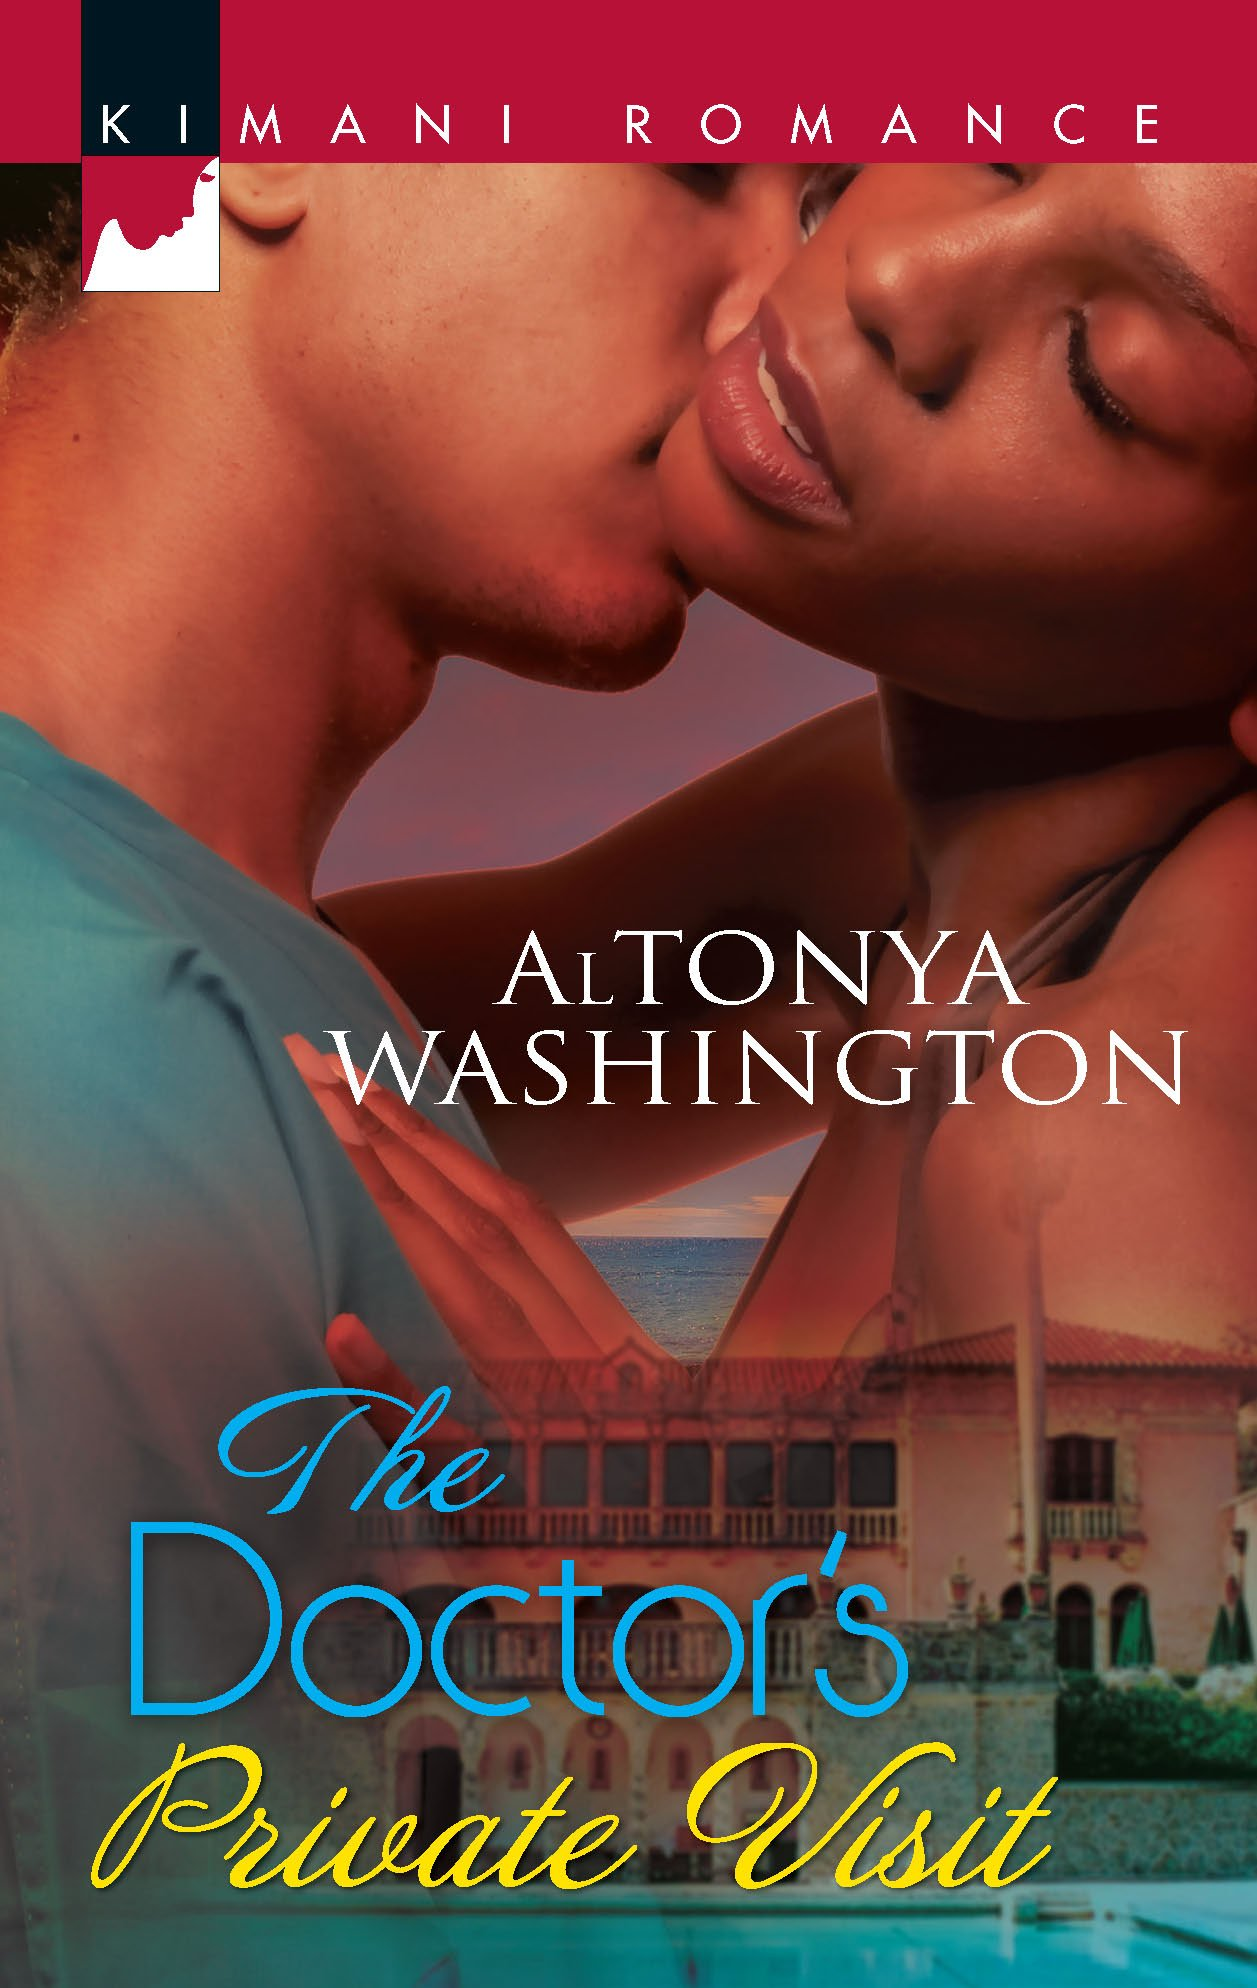 Amazon.com: The Doctor's Private Visit (Kimani Romance) (9780373861460):  AlTonya Washington: Books